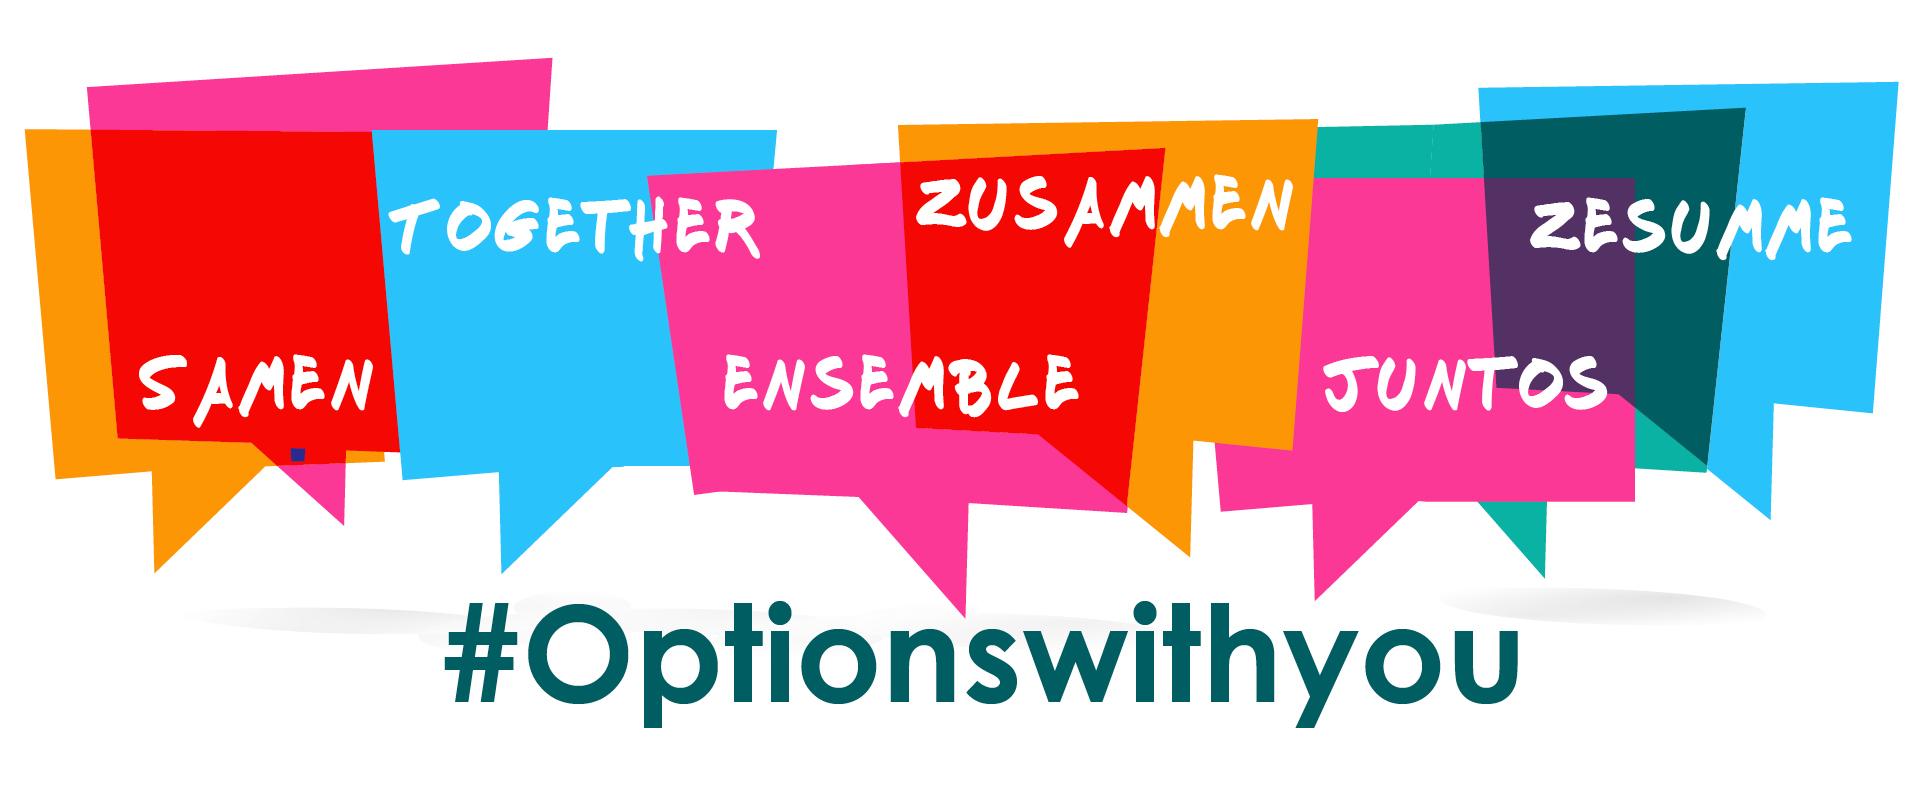 OptionsAvecVous